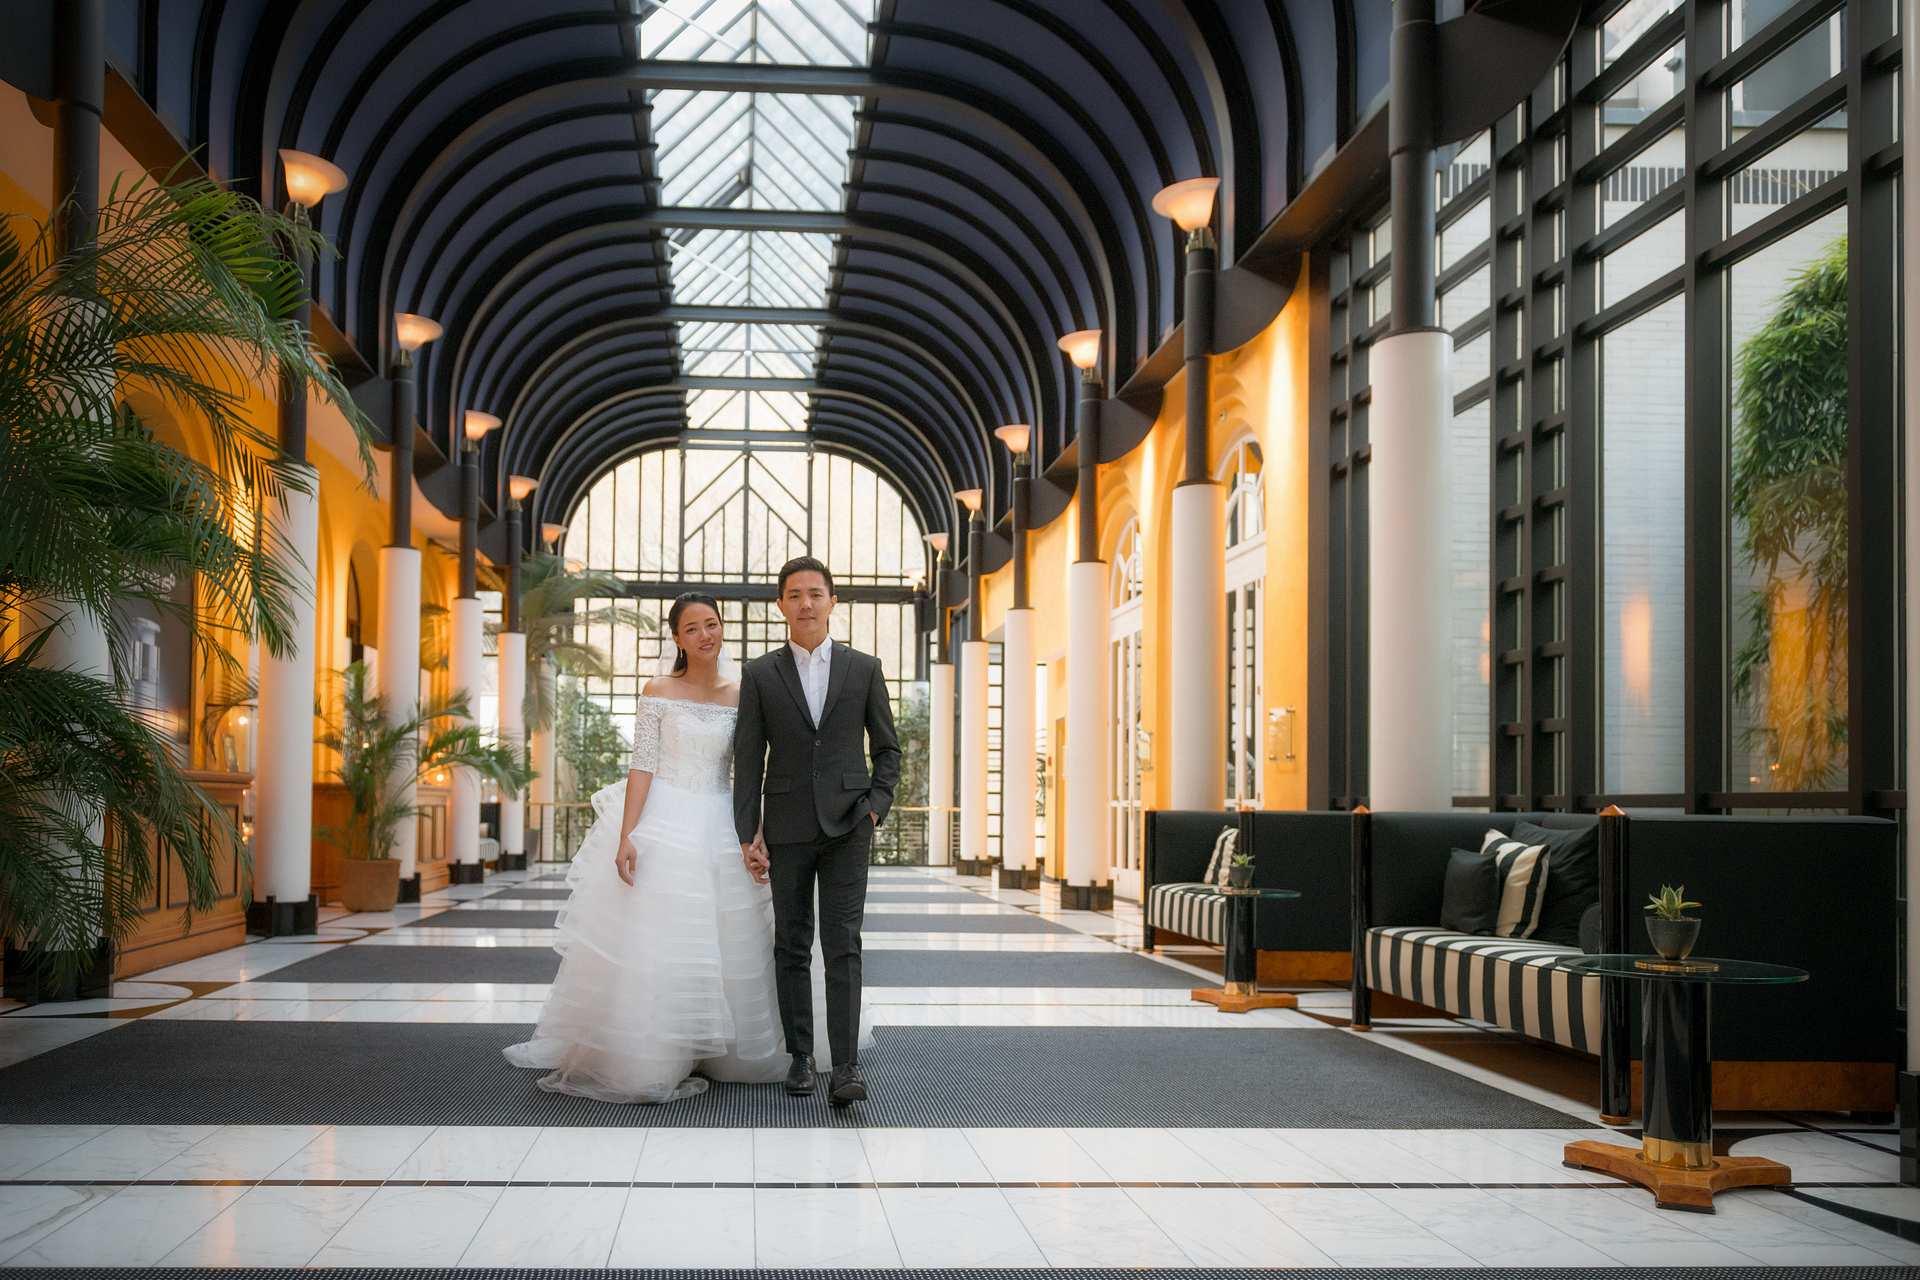 Wedding photos in Vicotira Jungfrau Hotel